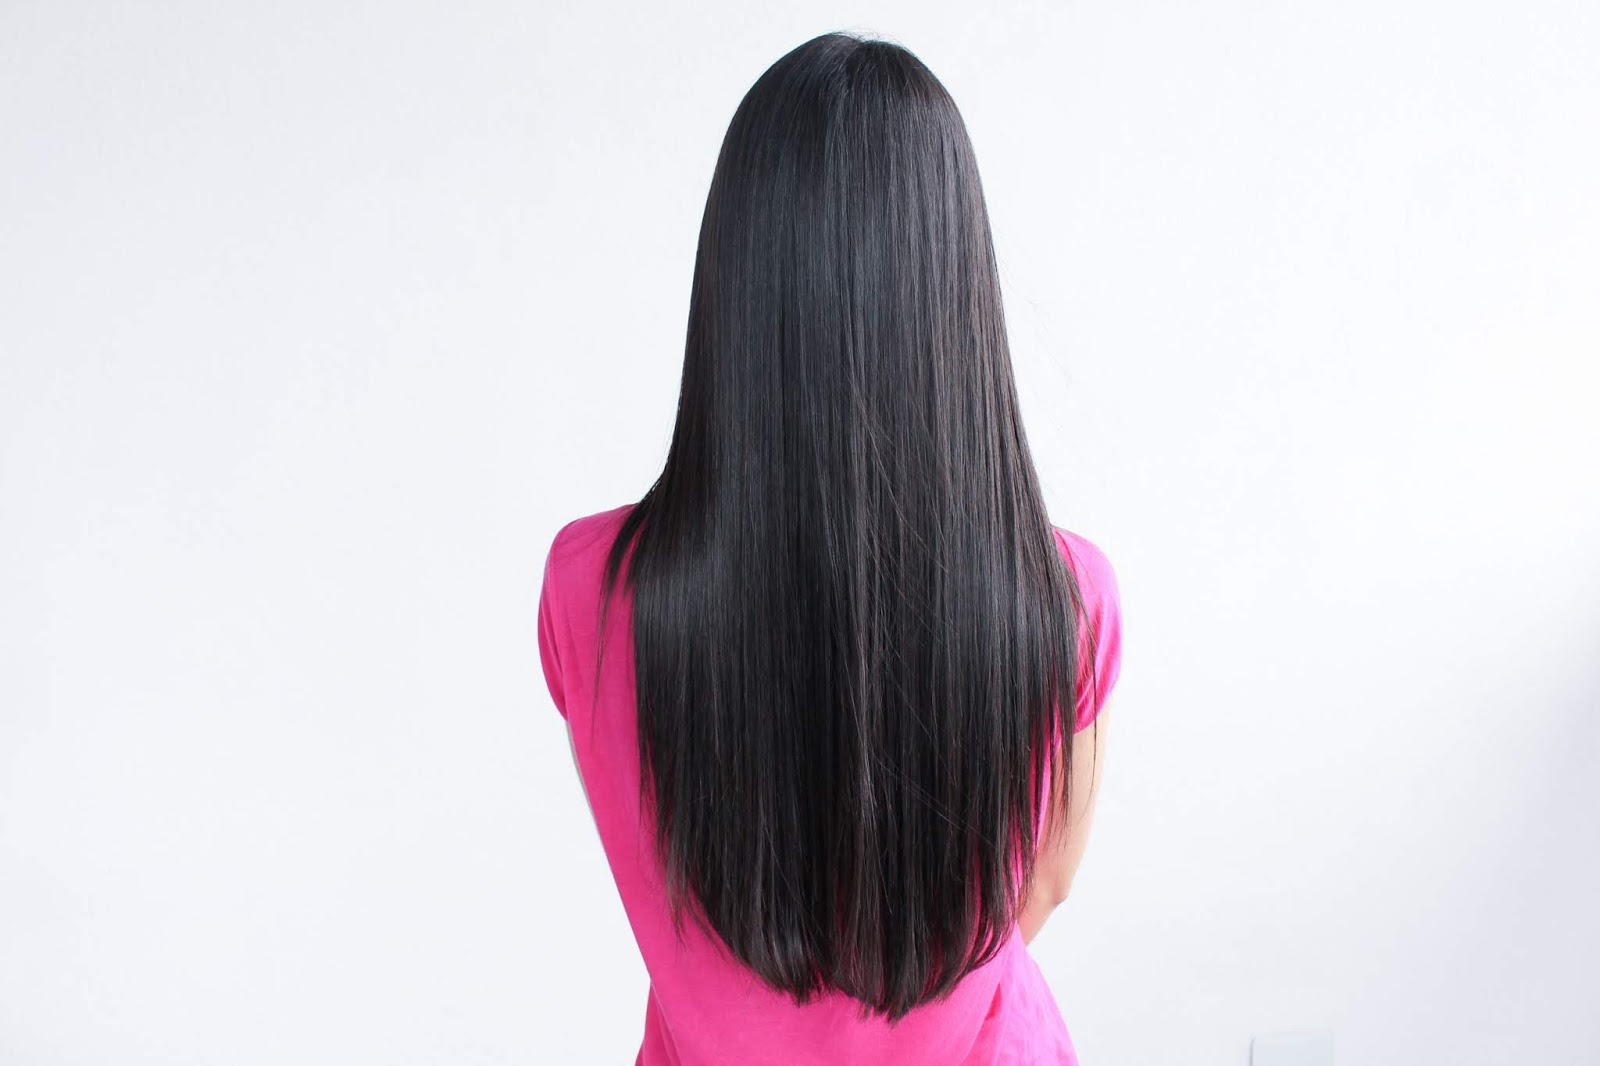 Resenha: Linha Micelar Natural Hair da Alpha Line